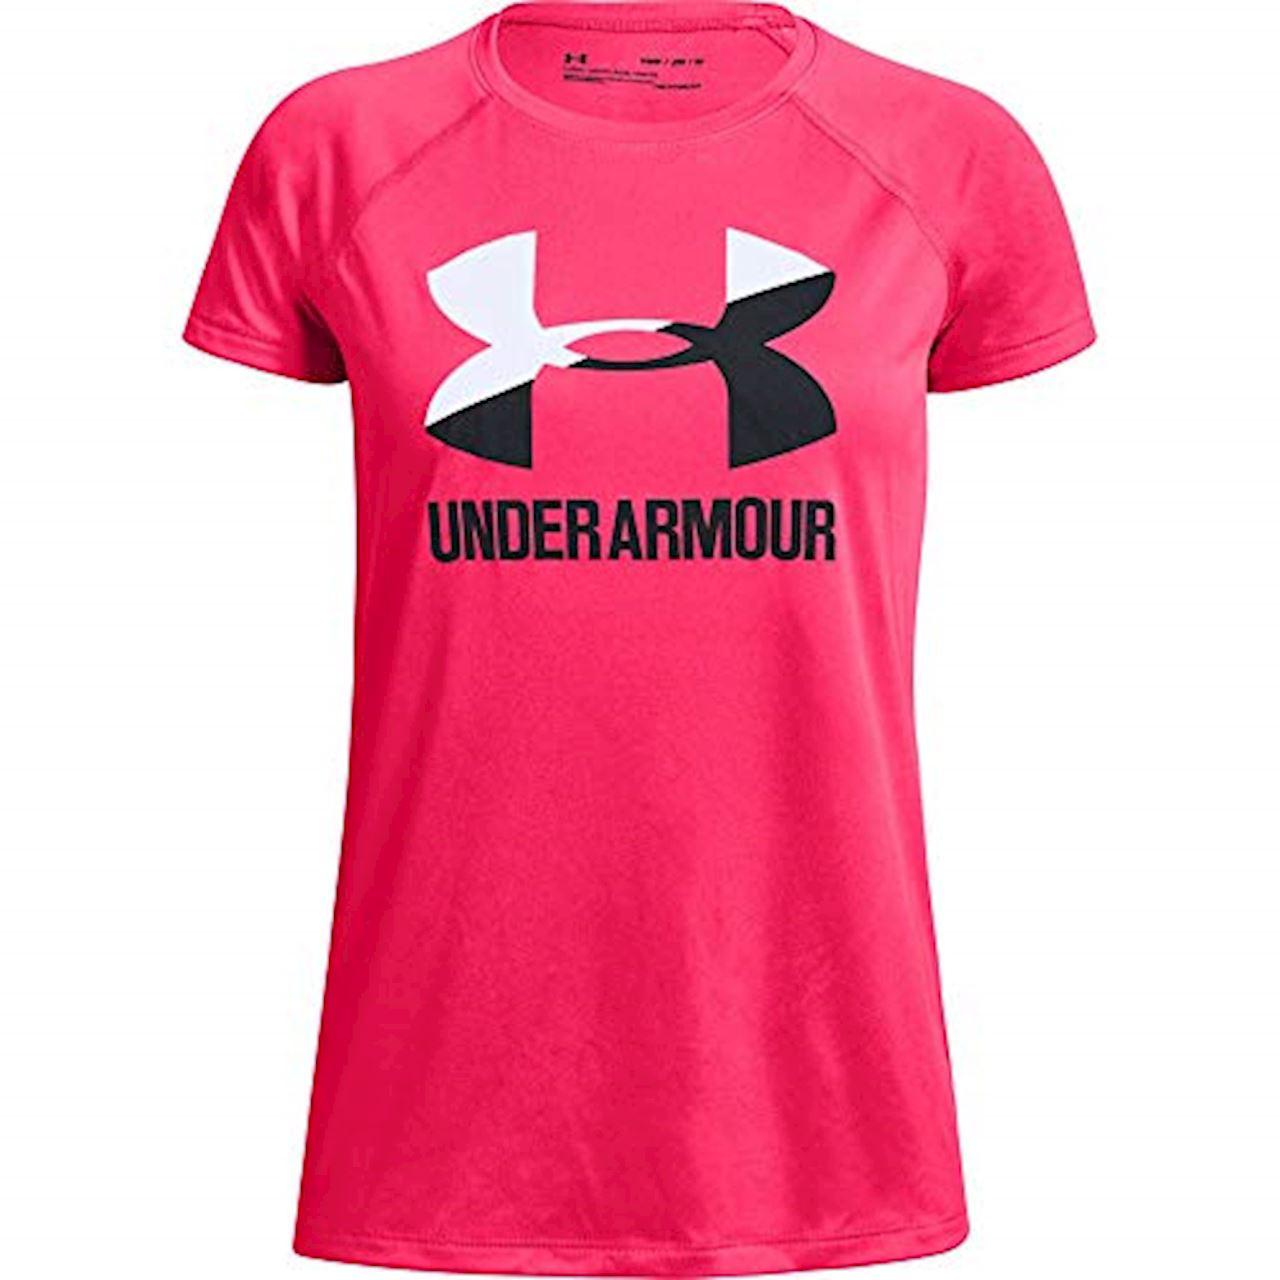 Girl's Short Sleeve Big Logo Solid Tee, Pink, swatch